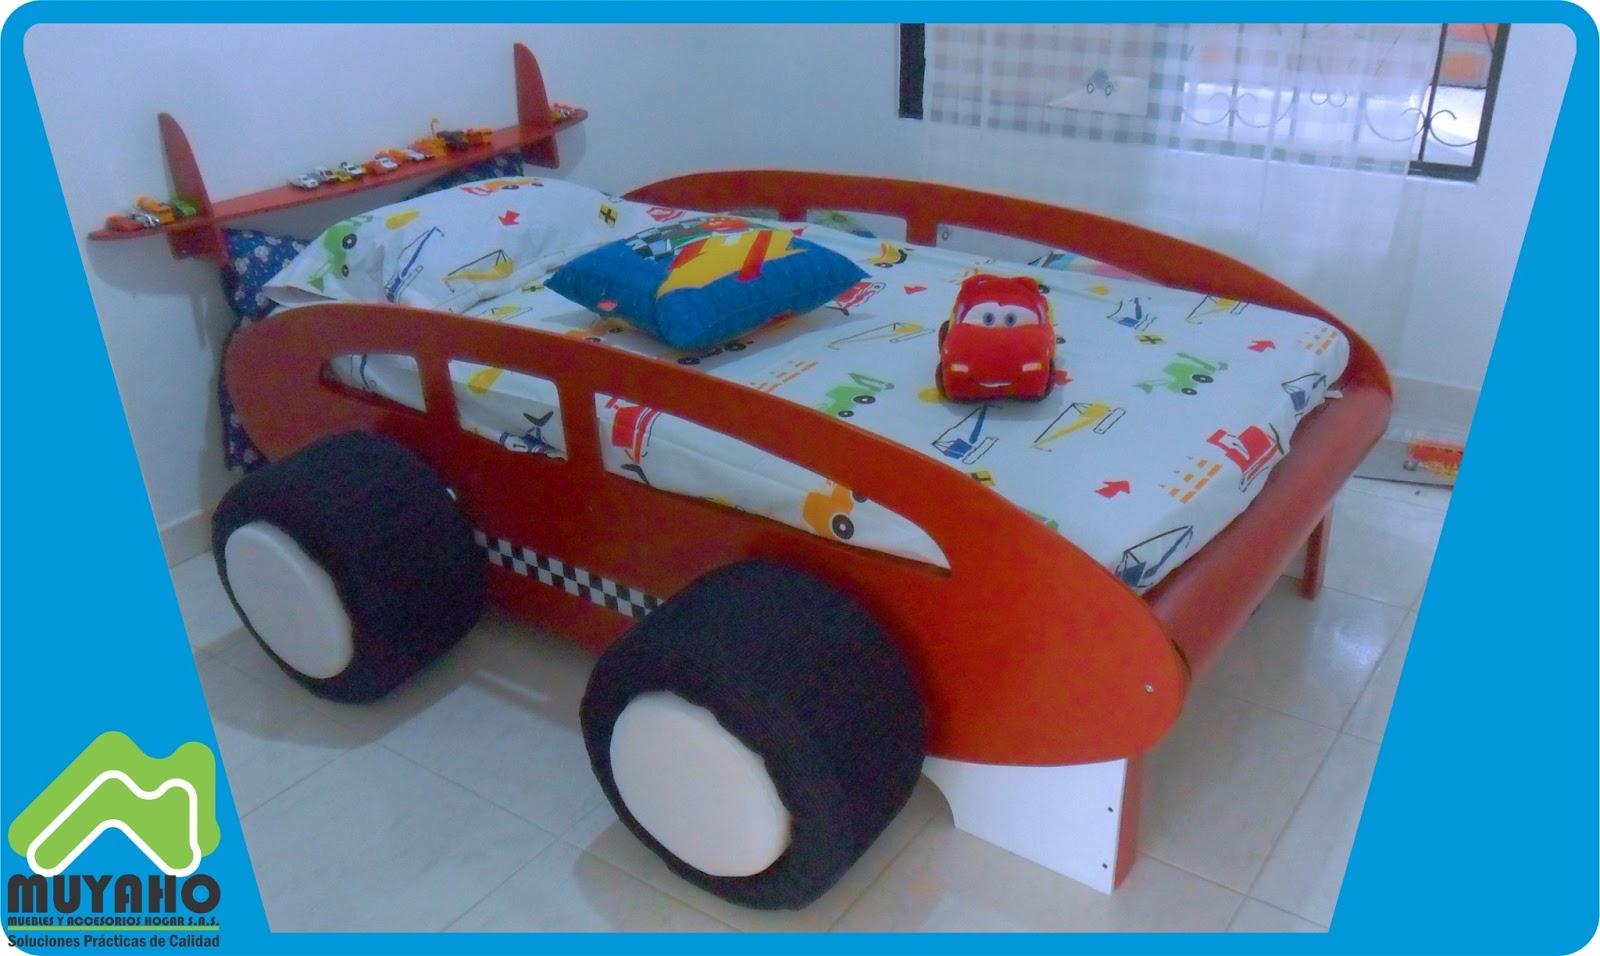 Muebles y accesorios hogar s a s - Cama infantil cars ...